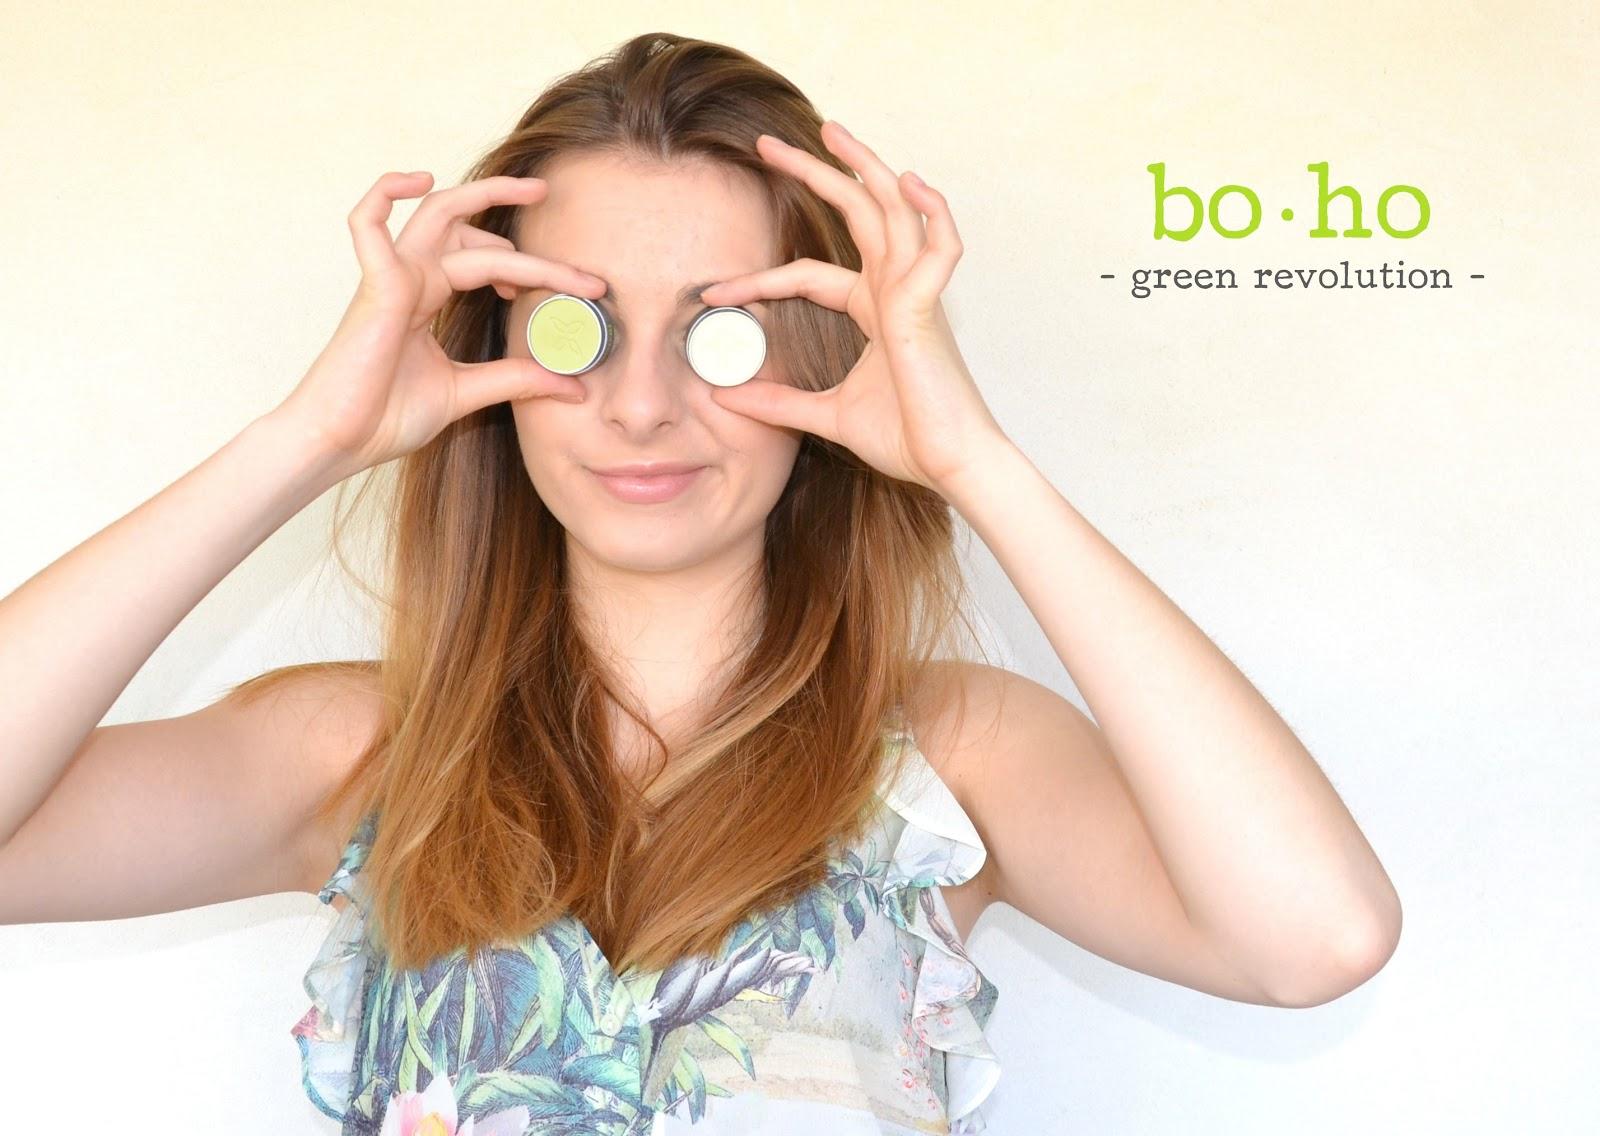 boho green maquillage bio